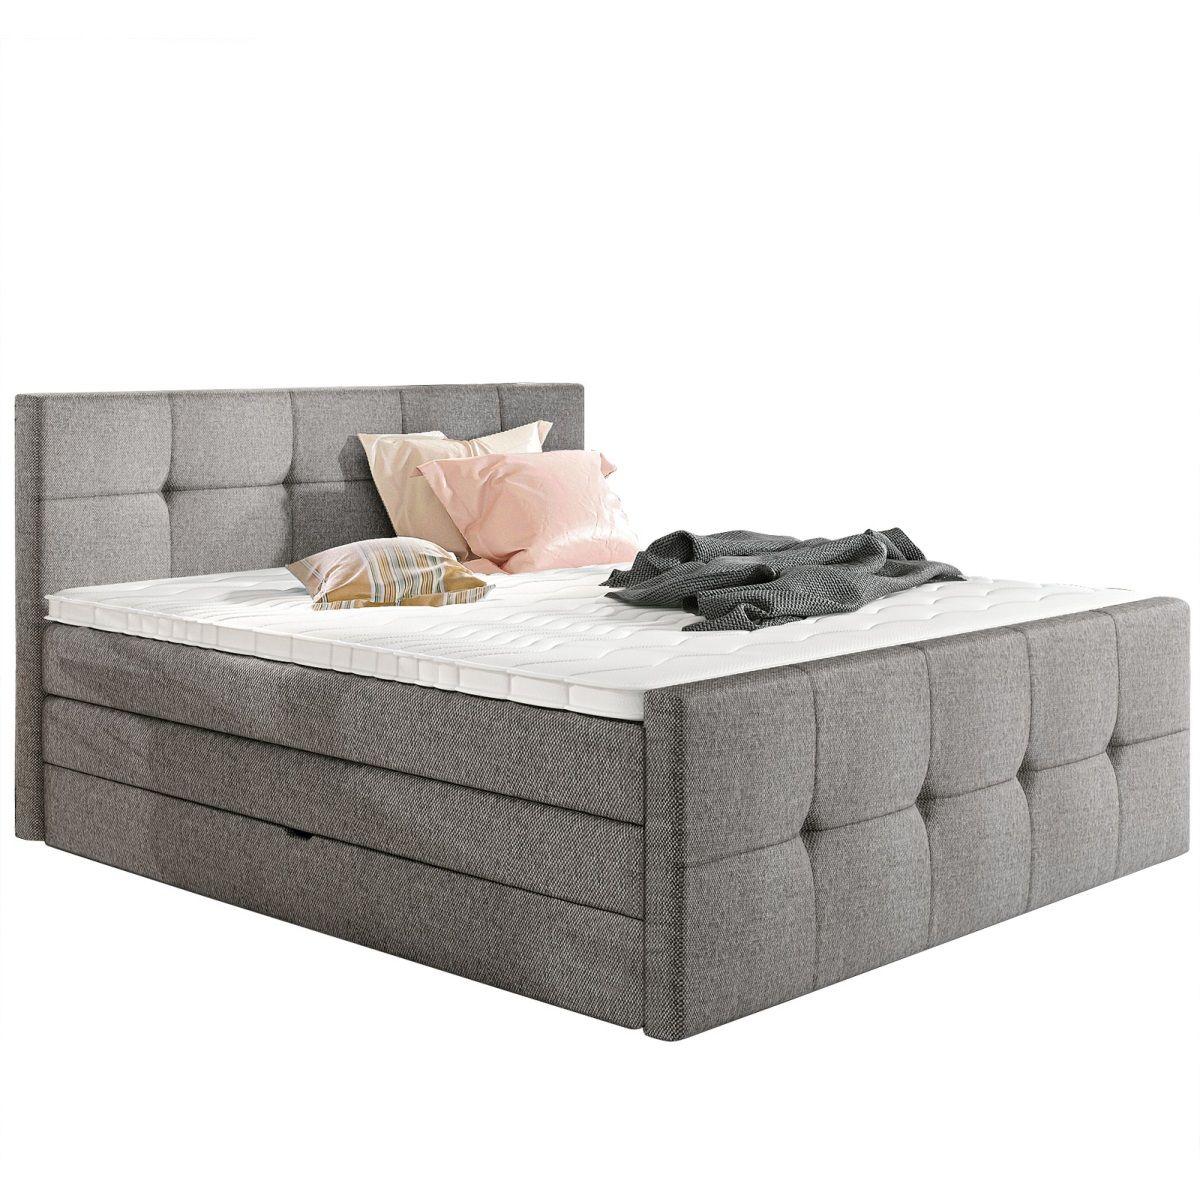 vito Bett PLAIN Stoffbezug Silber #schlafzimmer #bett #wohnidee ...